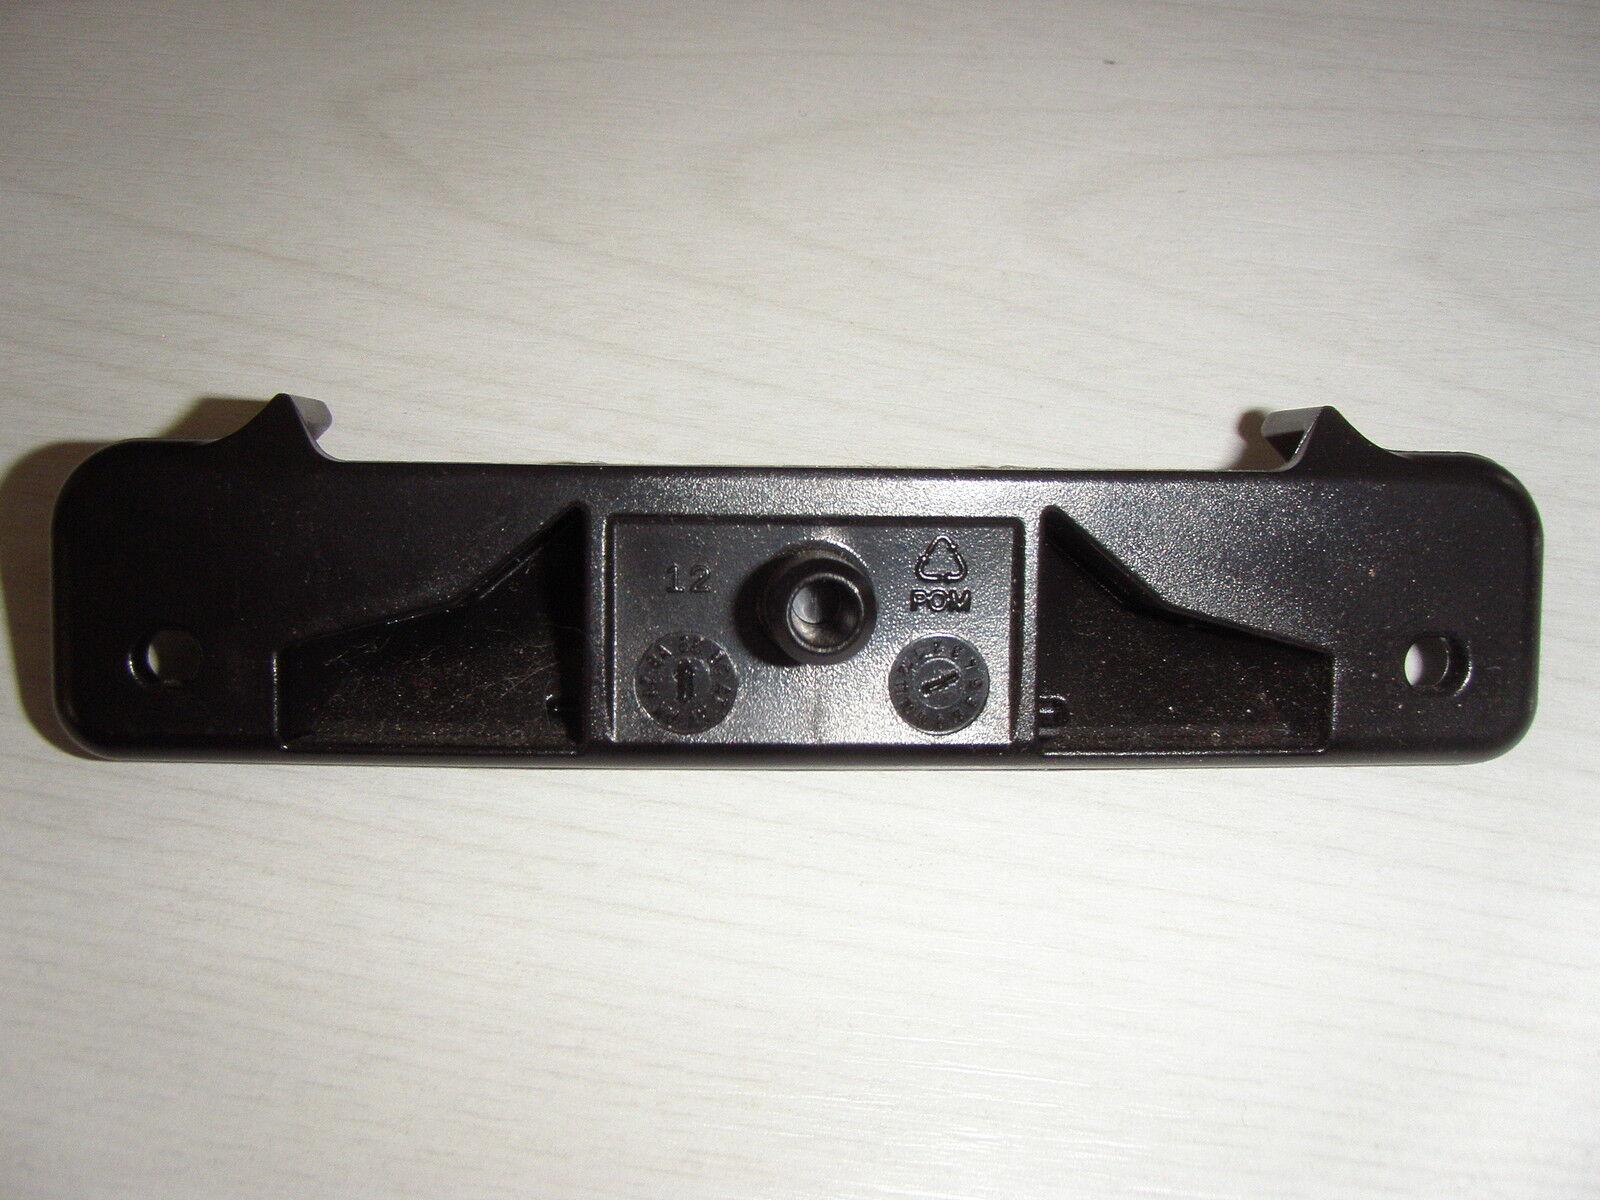 Kopp Malta Druck-//Wechsel-Dimmer 40-400 W//VA weiß Drehschalter Schalter UP NEU